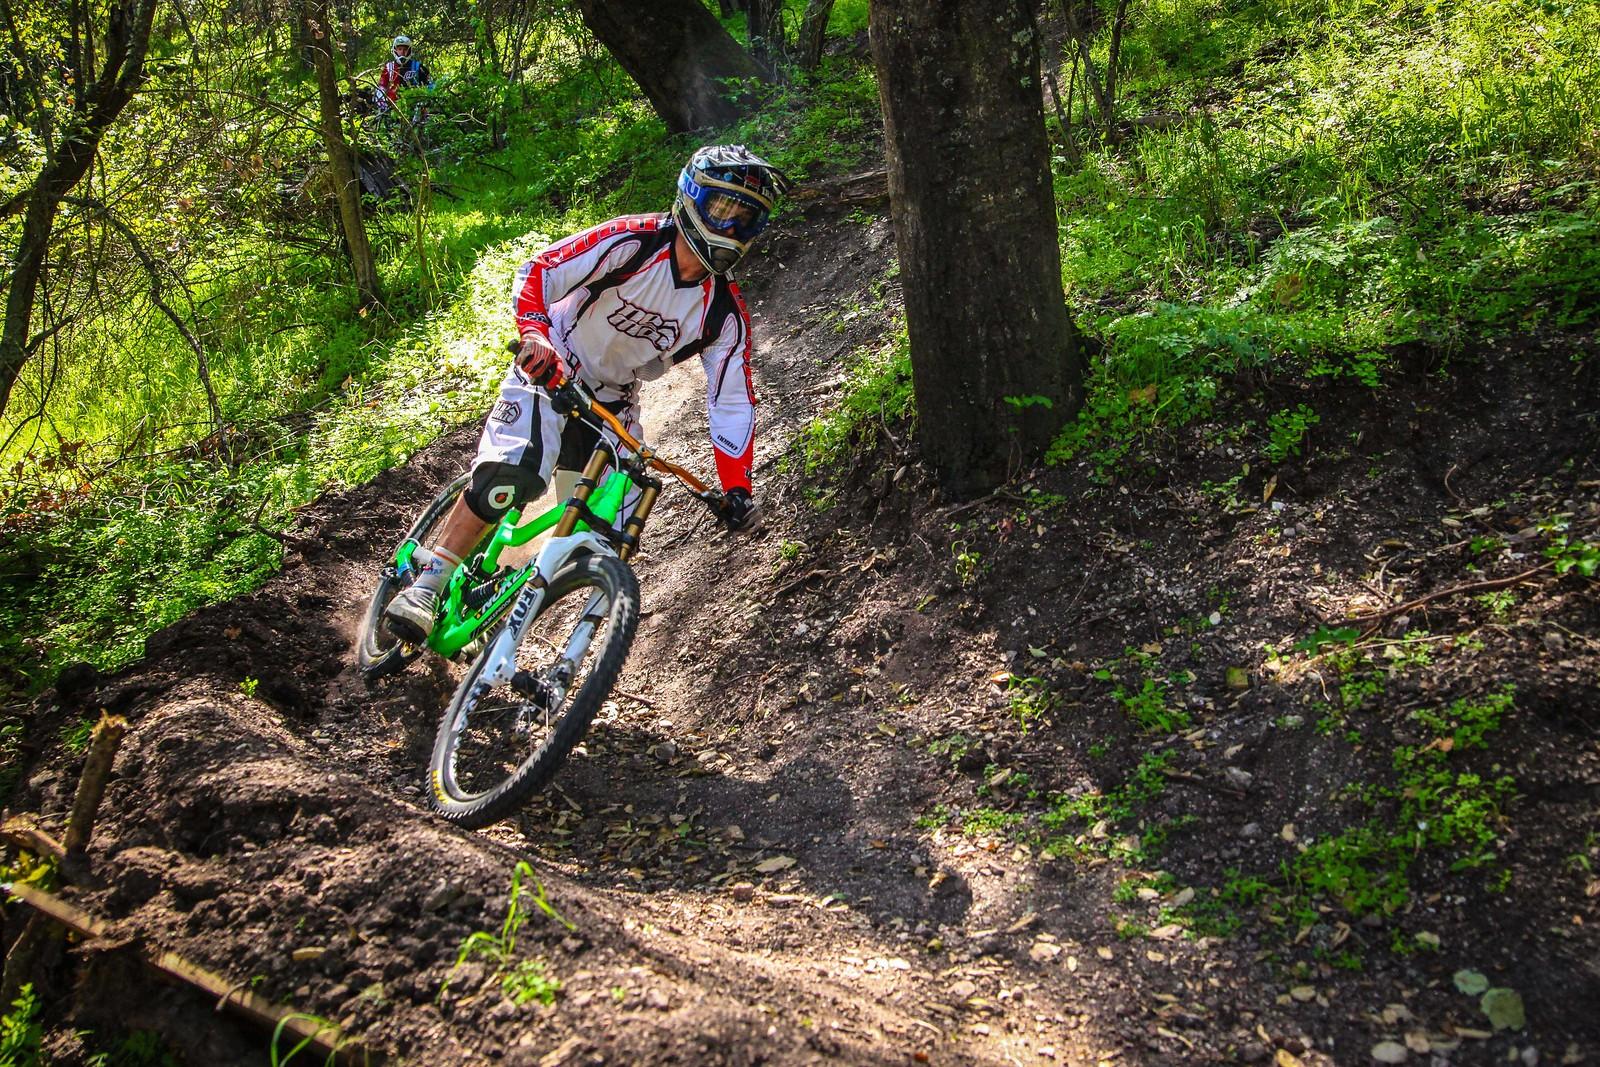 IMG 3053 - GnarHuck - Mountain Biking Pictures - Vital MTB